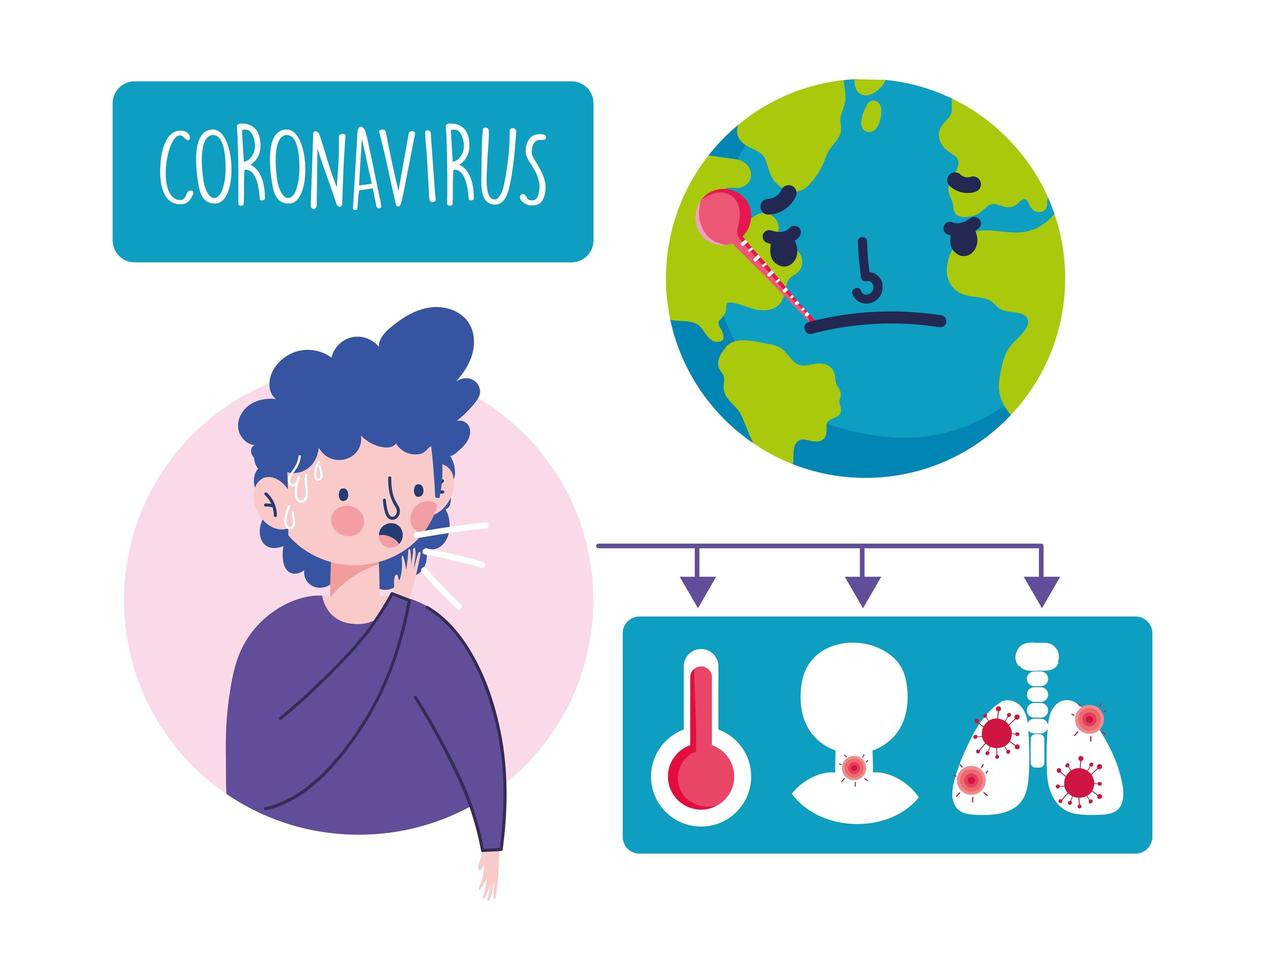 ung man med infographic coronavirus symptom vektor